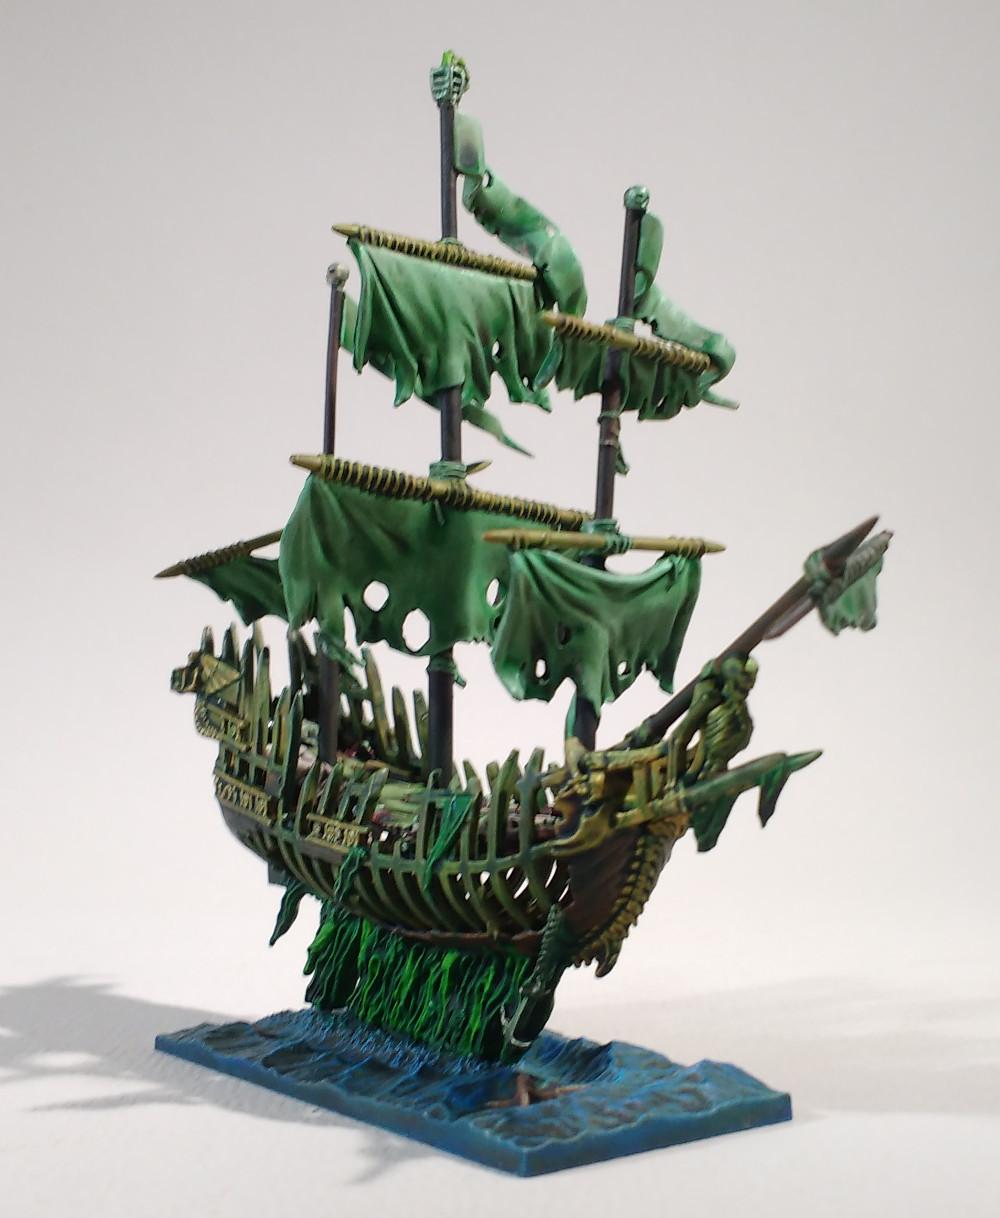 Dreadfleet : des navires dans le monde de Warhammer 17110312252523099315352629